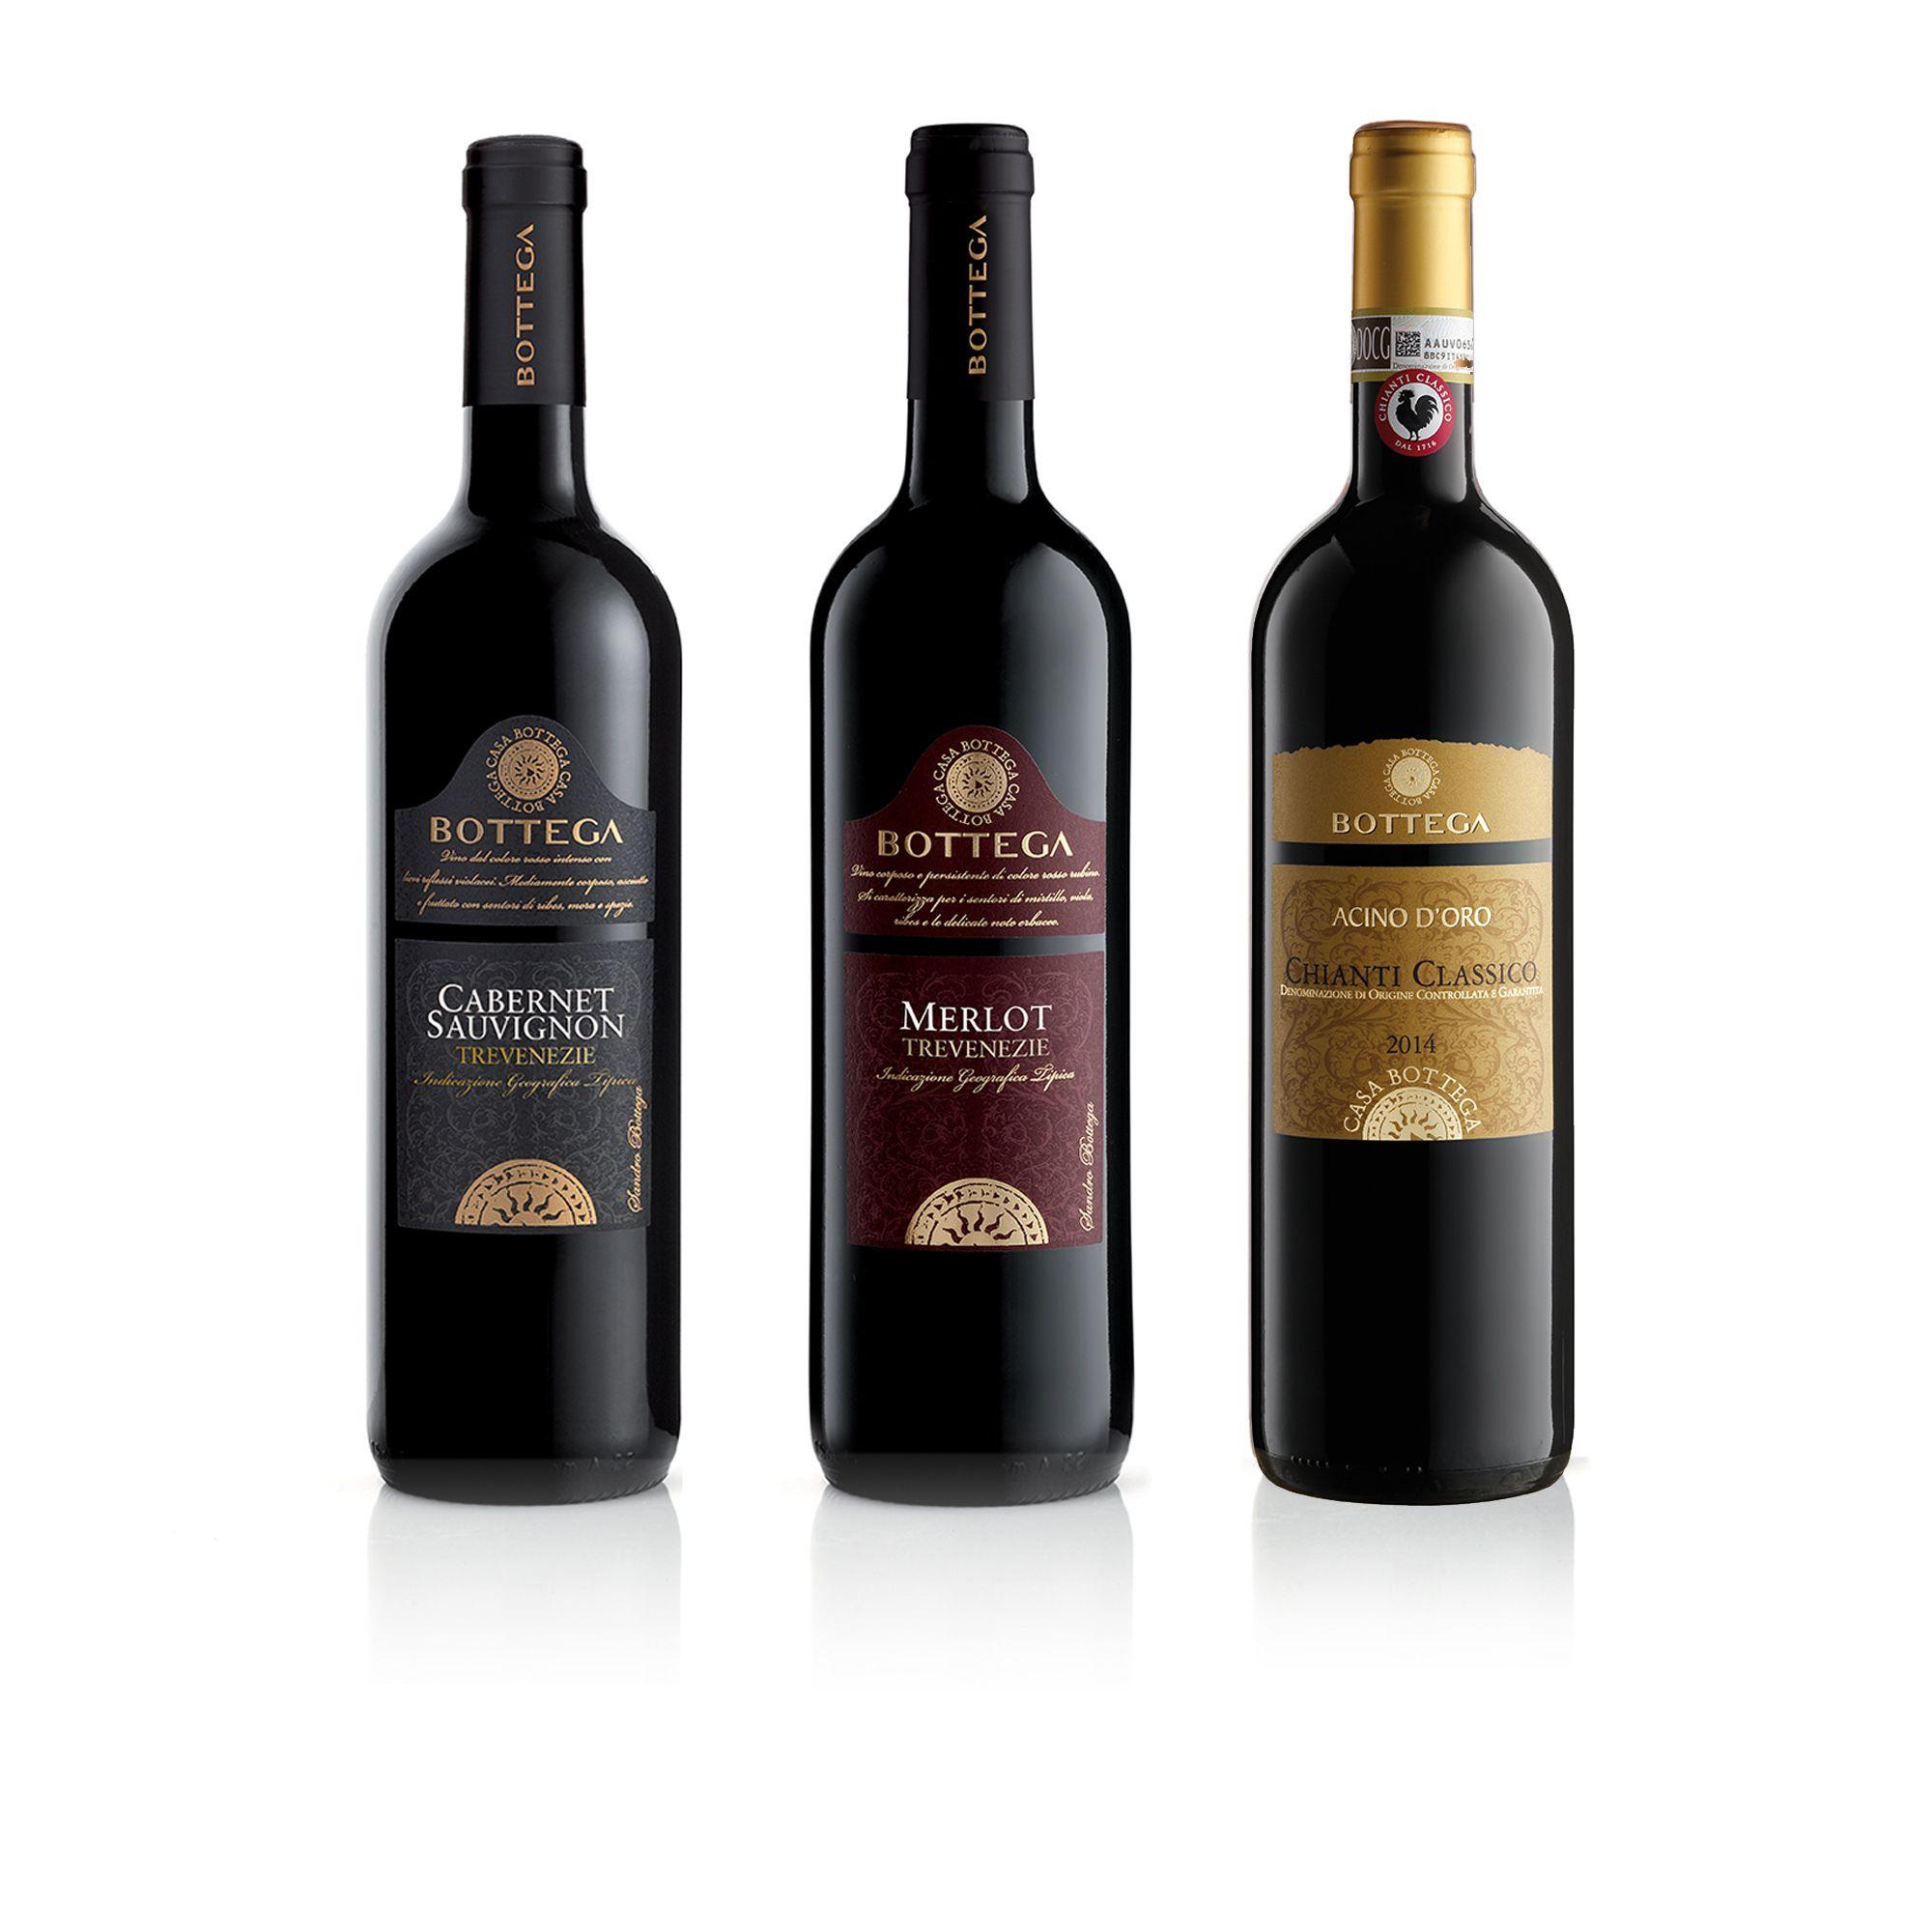 Merlot Igt, Cabernet Sauvignon, Chianti Classico